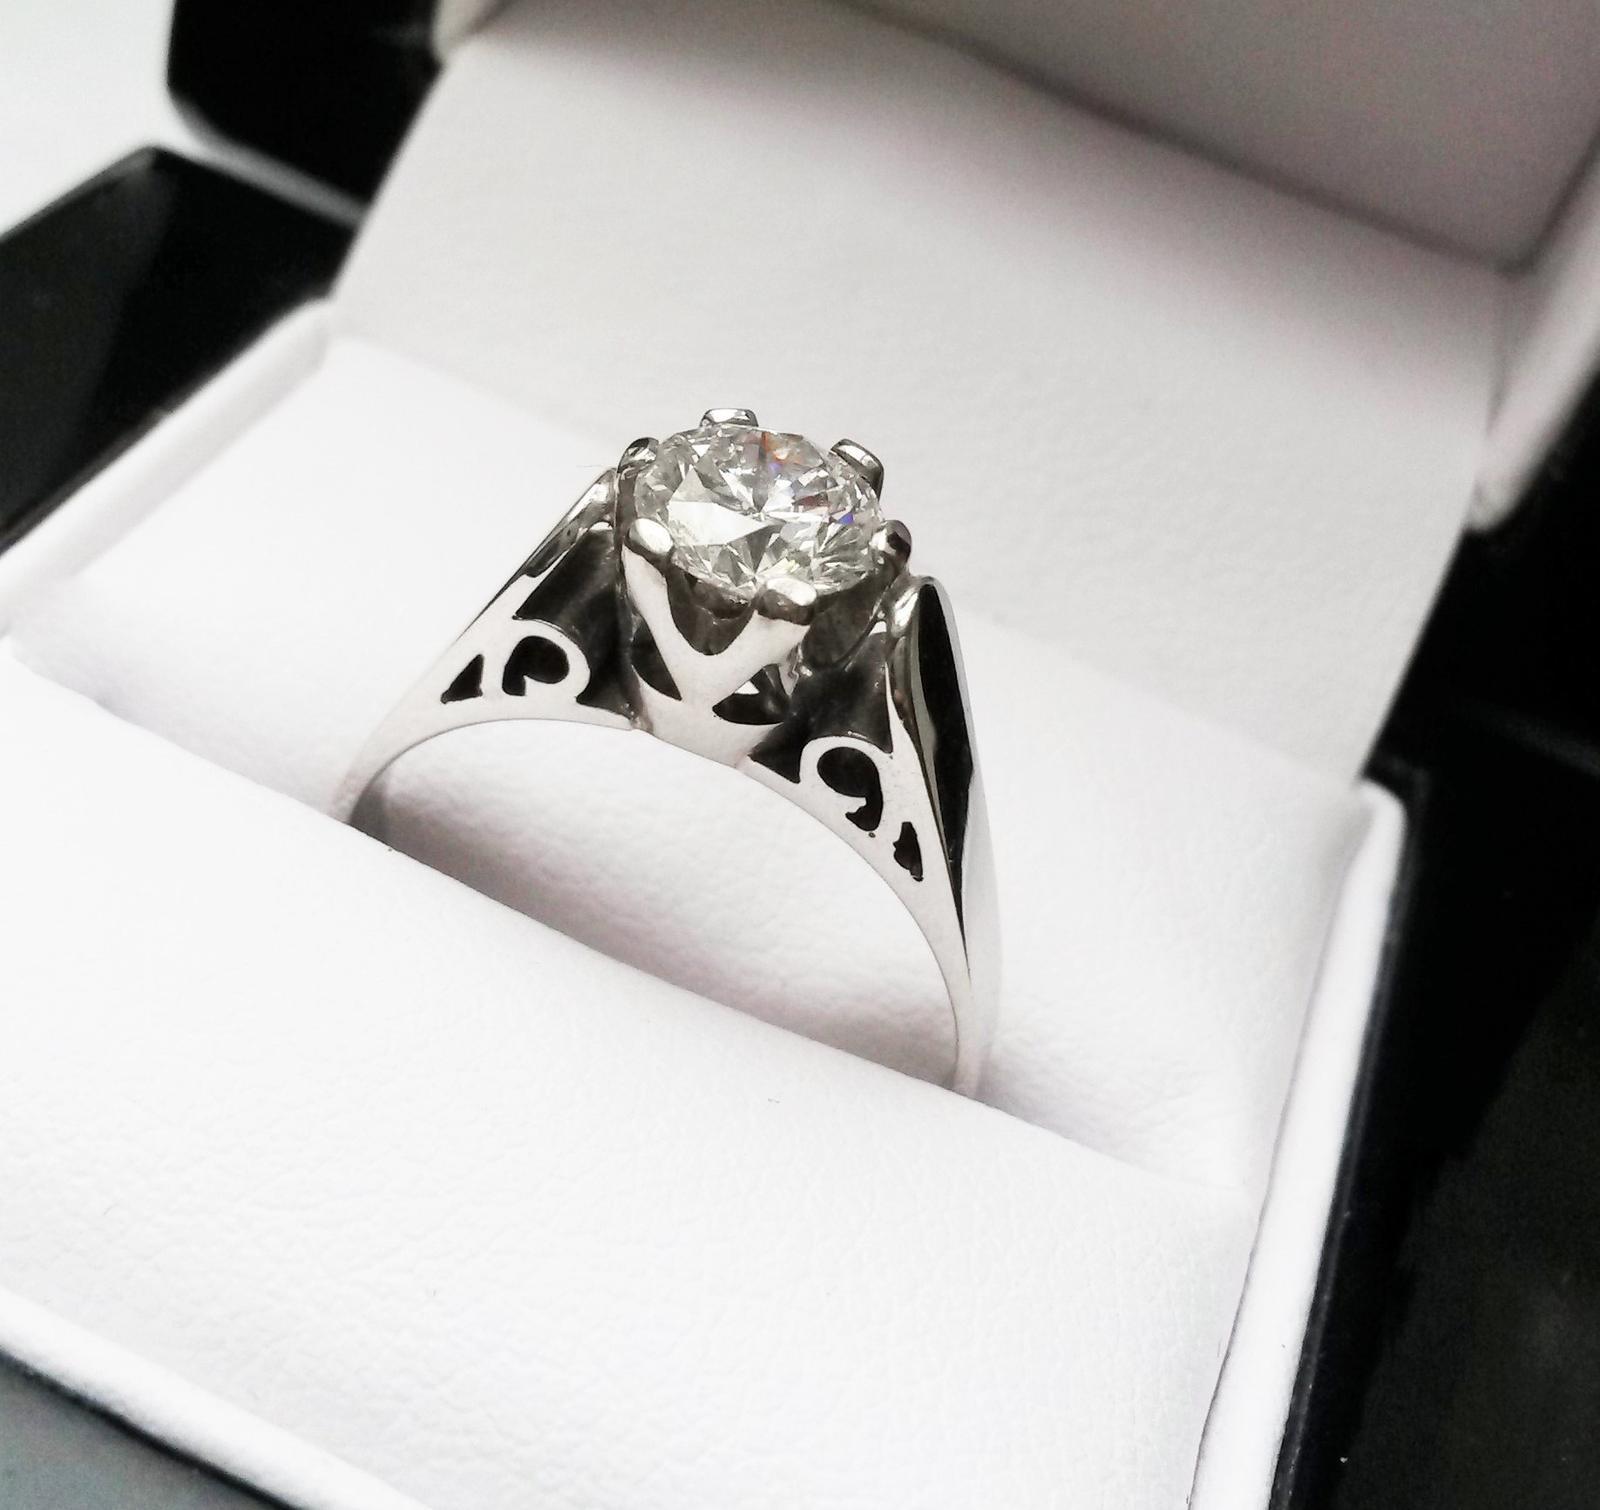 Luxusni Zasnubni Prsten S Briliantem 150 000 Kc Svatebni Shopy